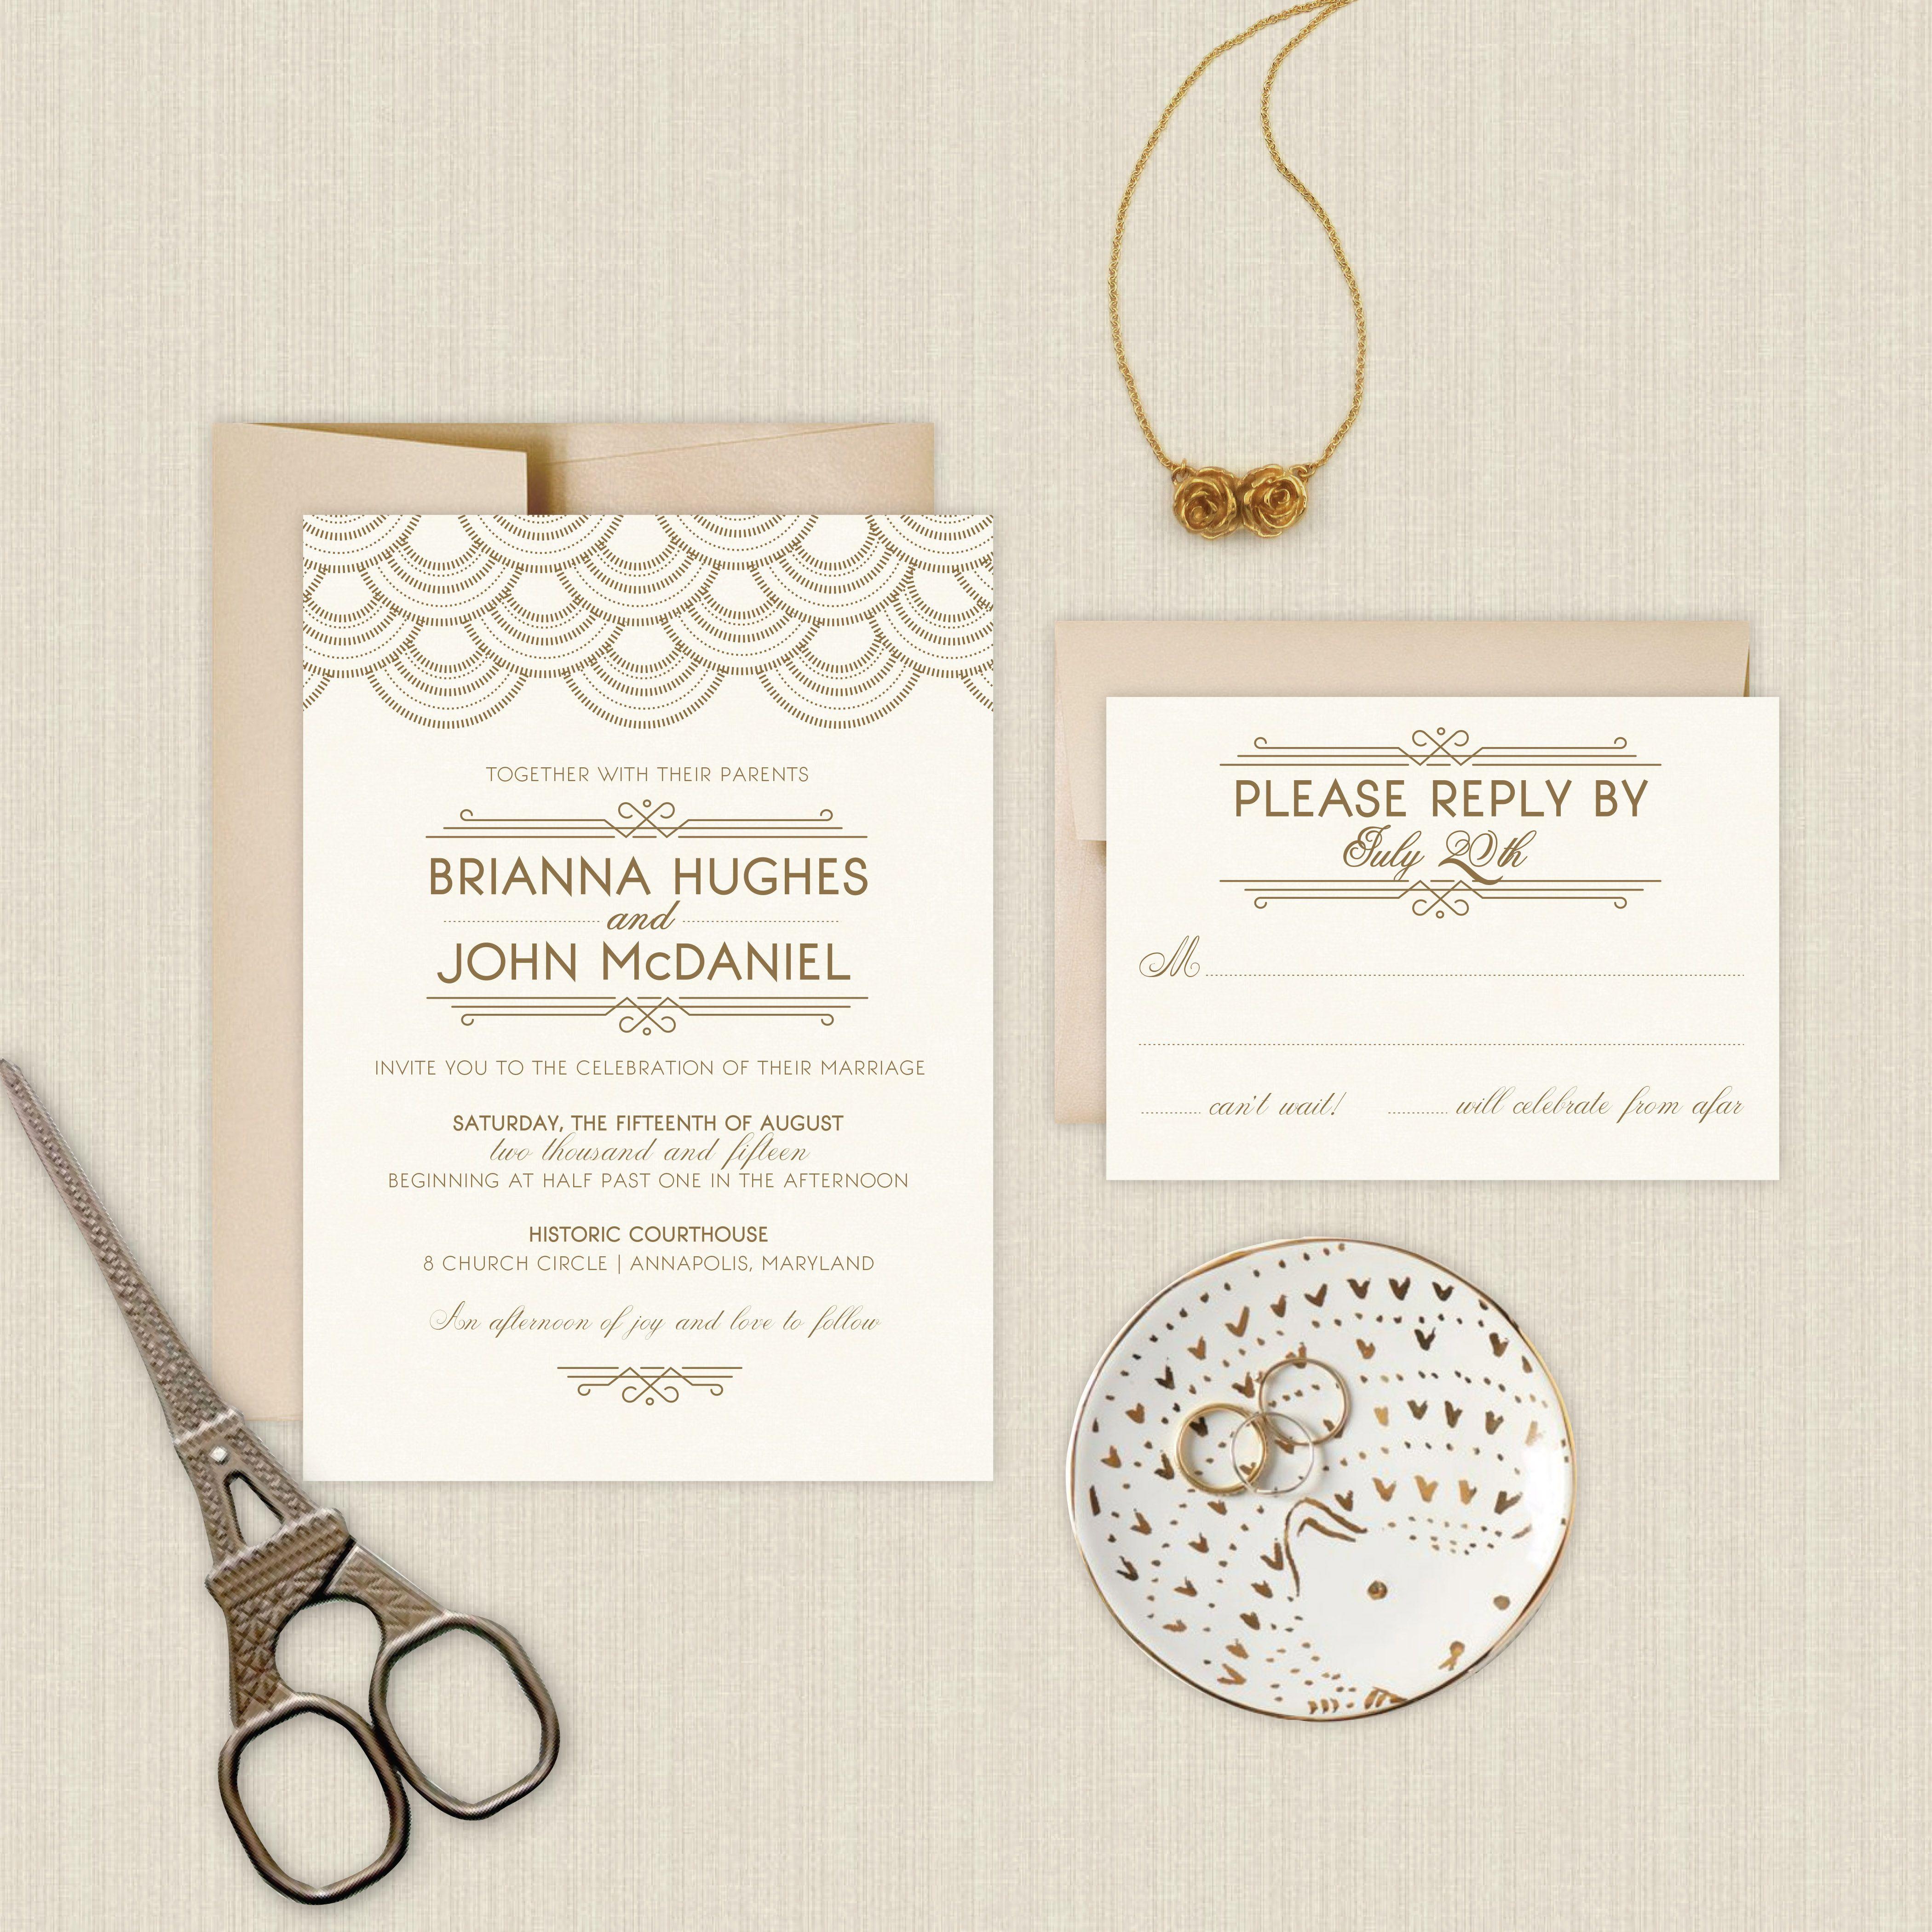 Art Deco Great Gatsby Inspired Wedding Invitations | Gold, Gream ...